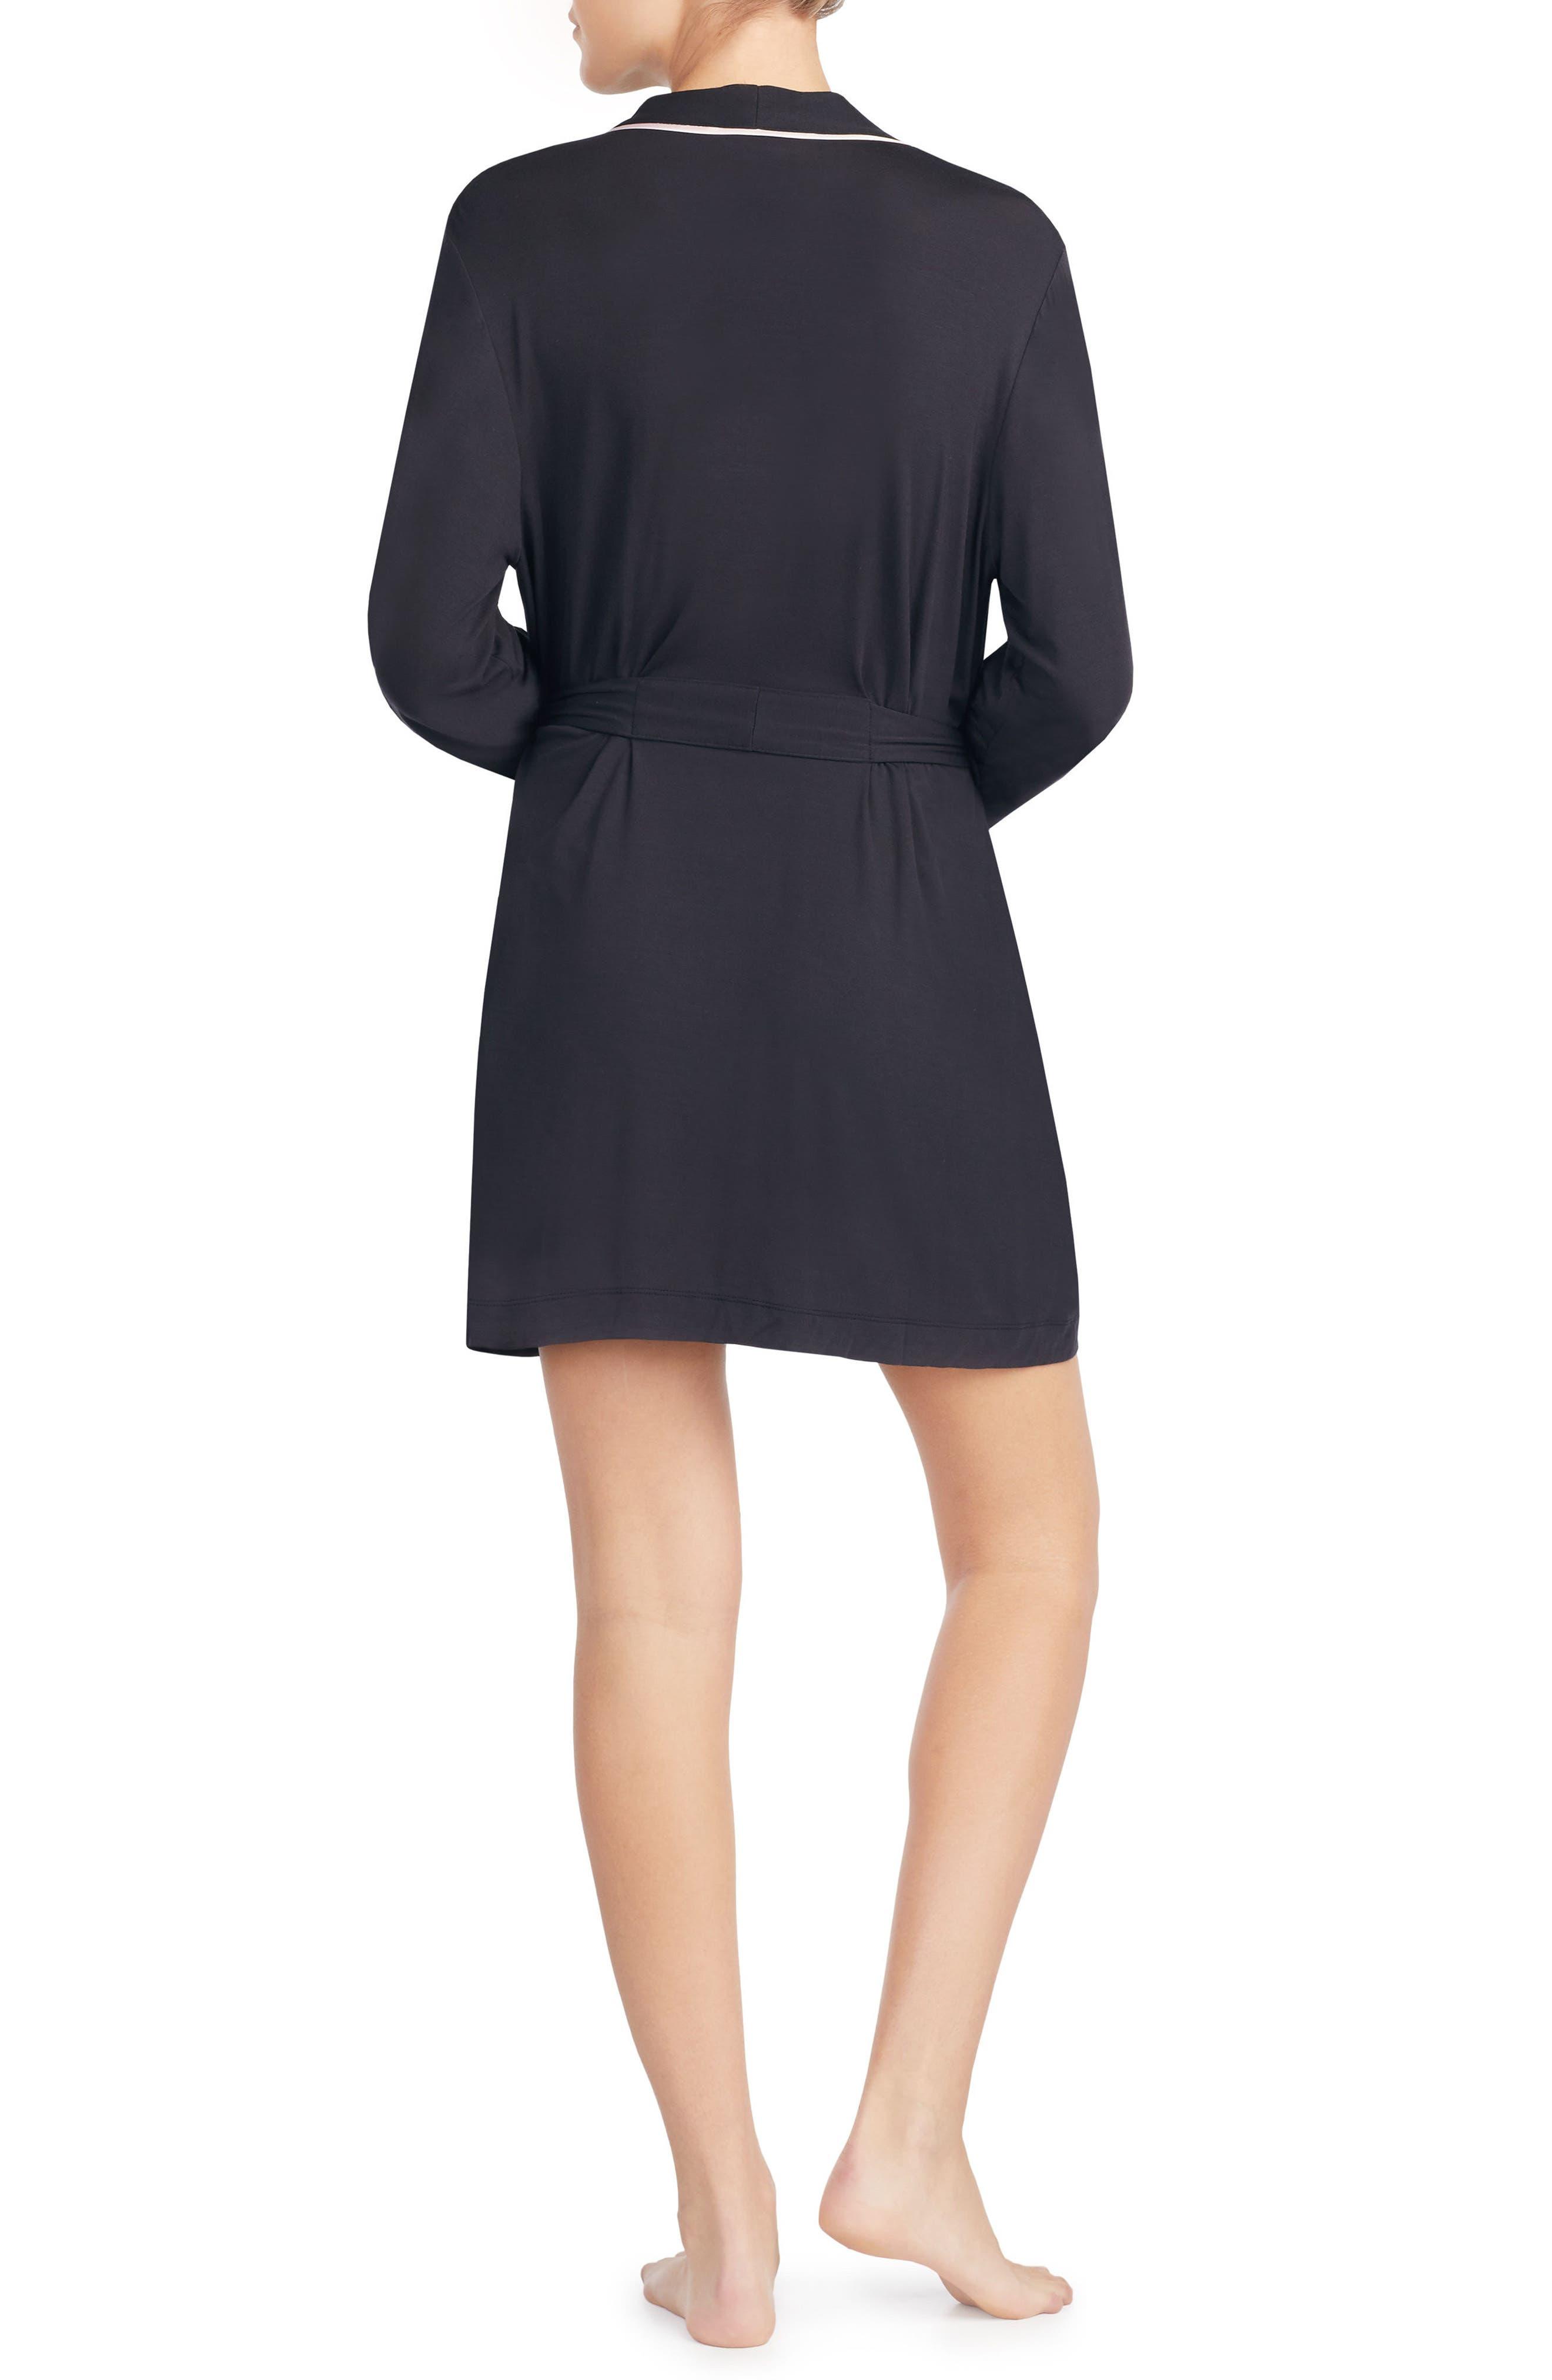 KATE SPADE NEW YORK, jersey short robe, Alternate thumbnail 2, color, BLACK